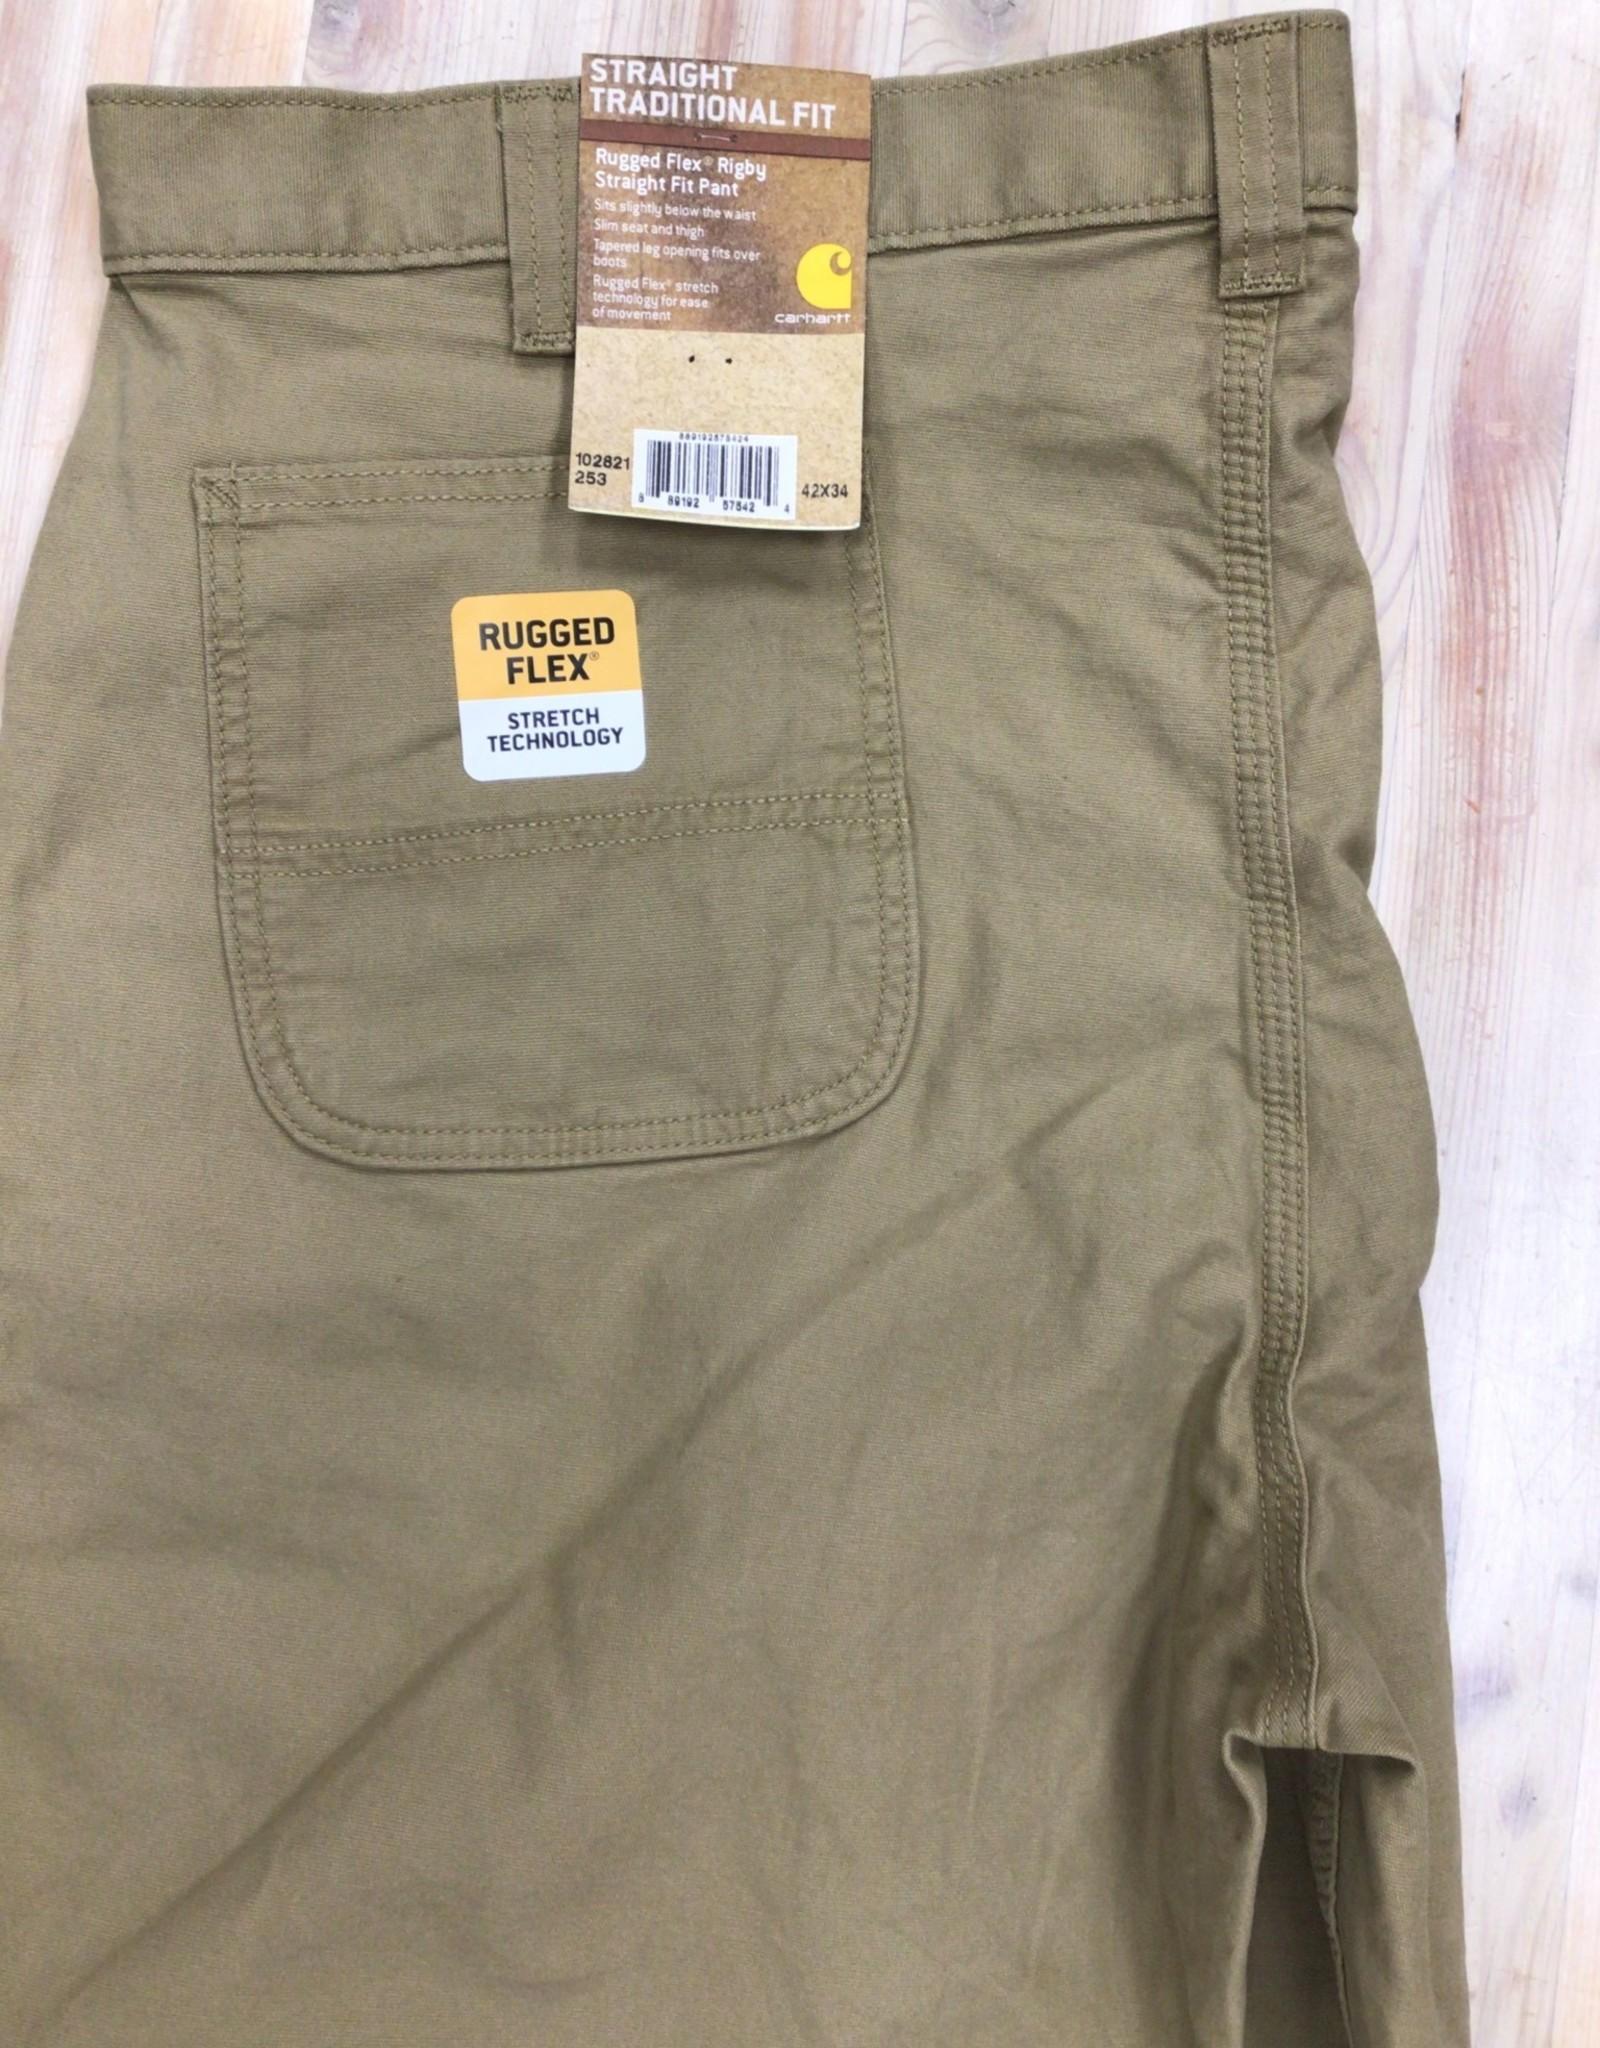 Carhartt Carhartt 102821 Rugged Flex Rigby Straight Fit Pant Men's